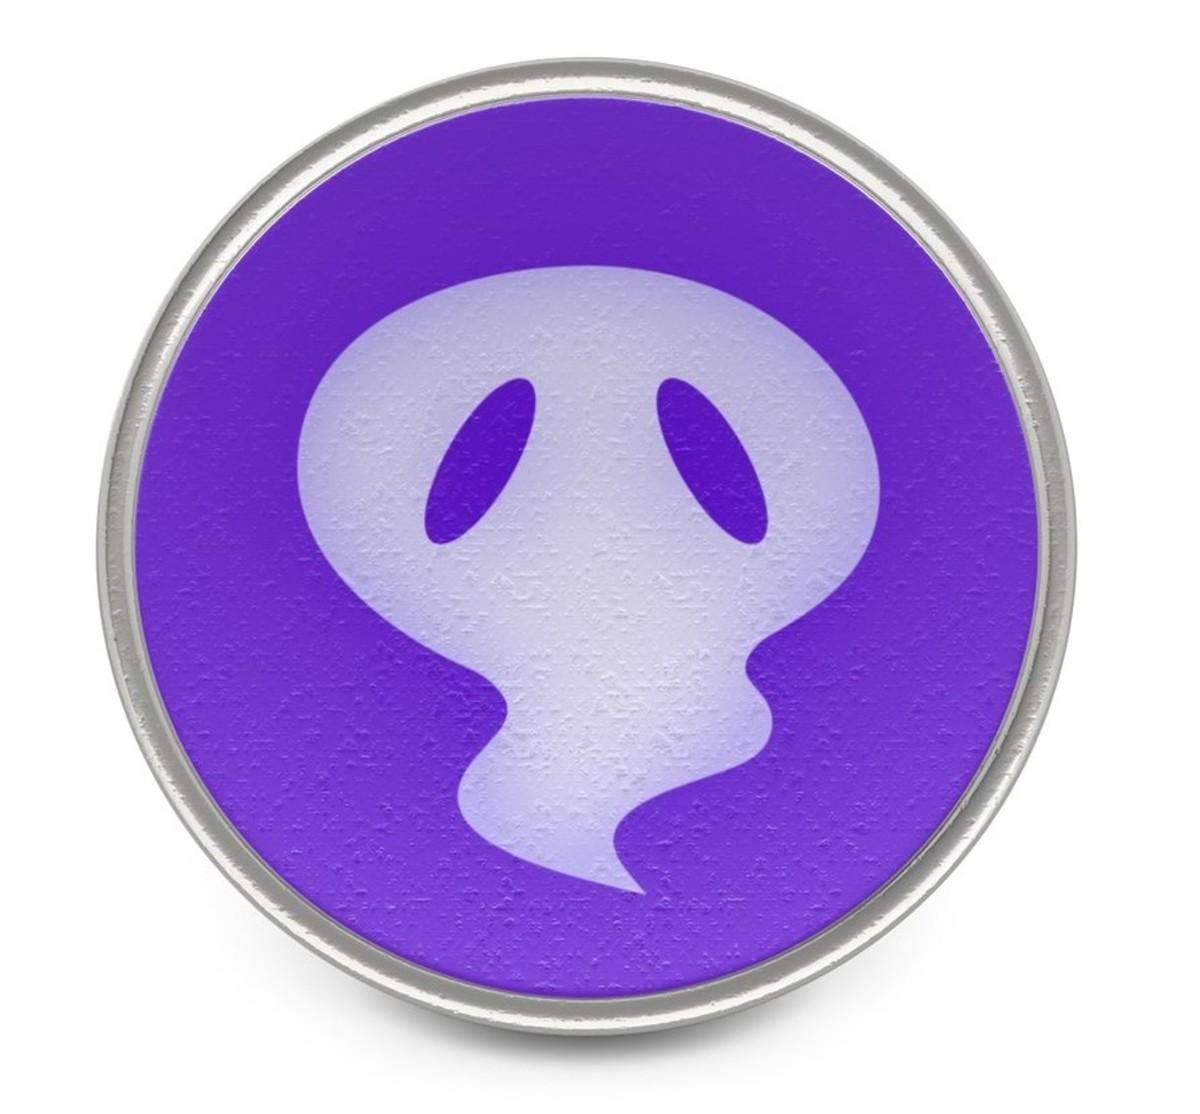 Ghost Pokémon logo